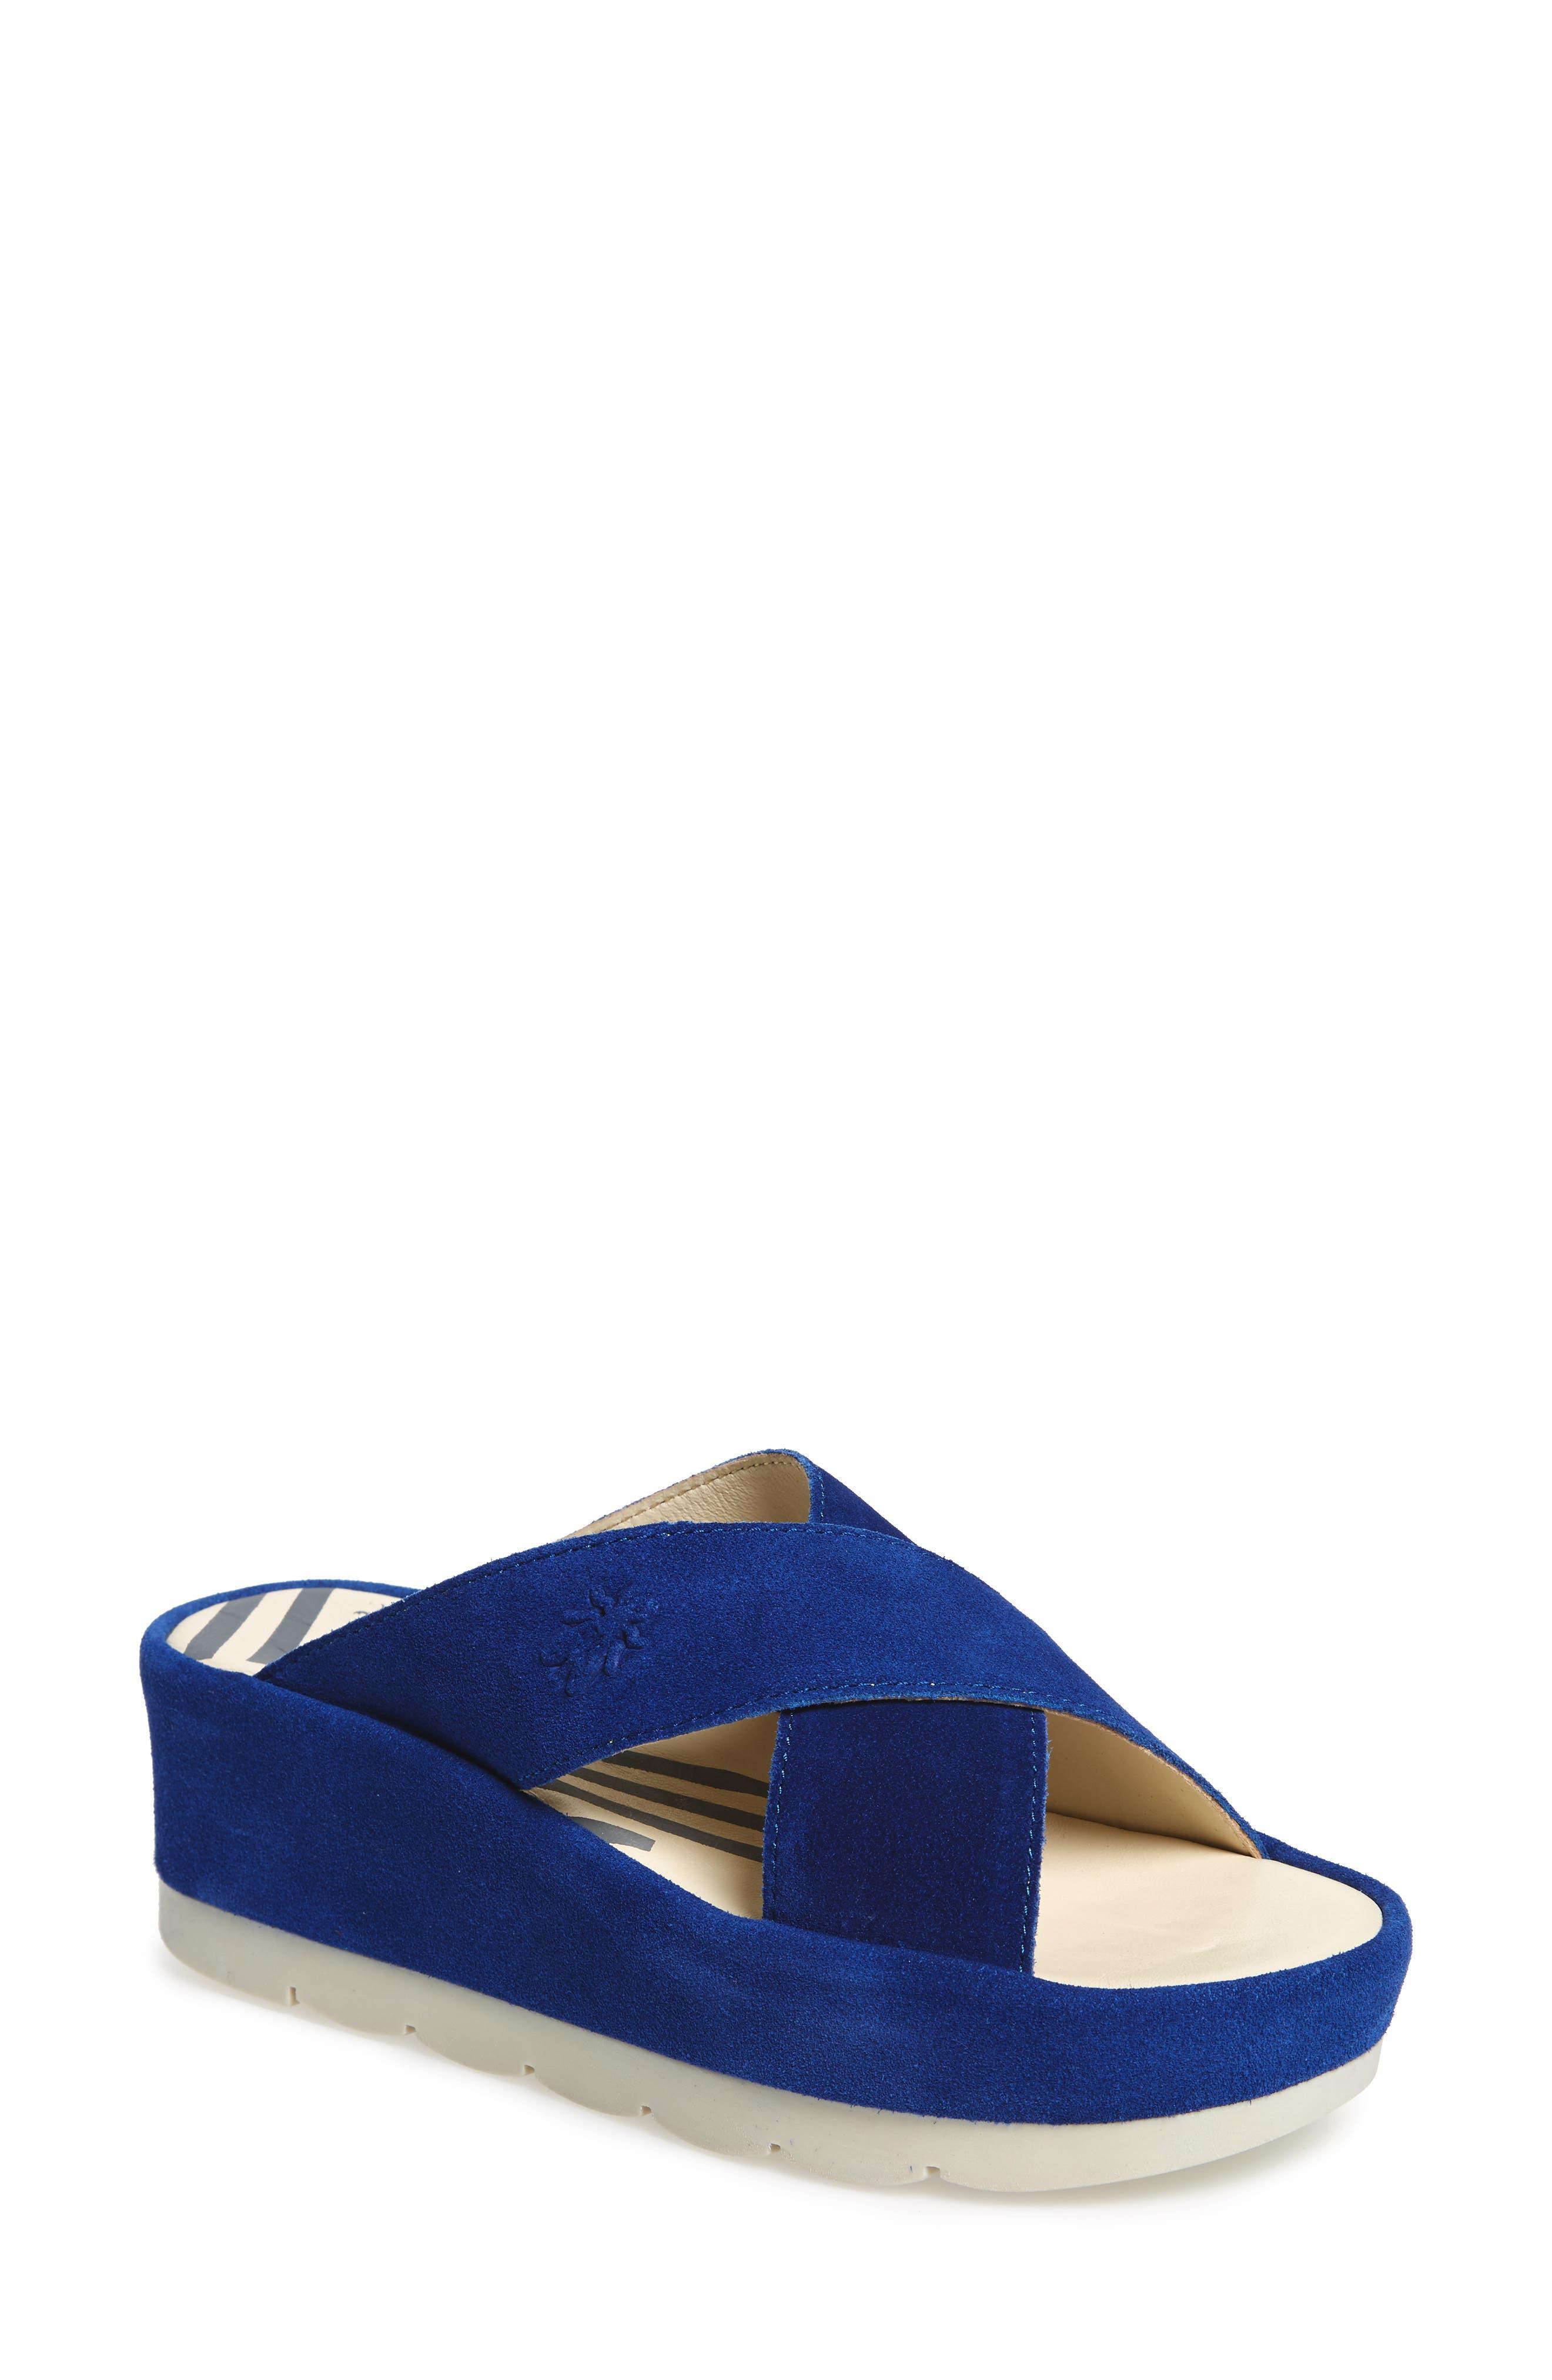 FLY LONDON, Begs Platform Slide Sandal, Main thumbnail 1, color, BLUE SUEDE